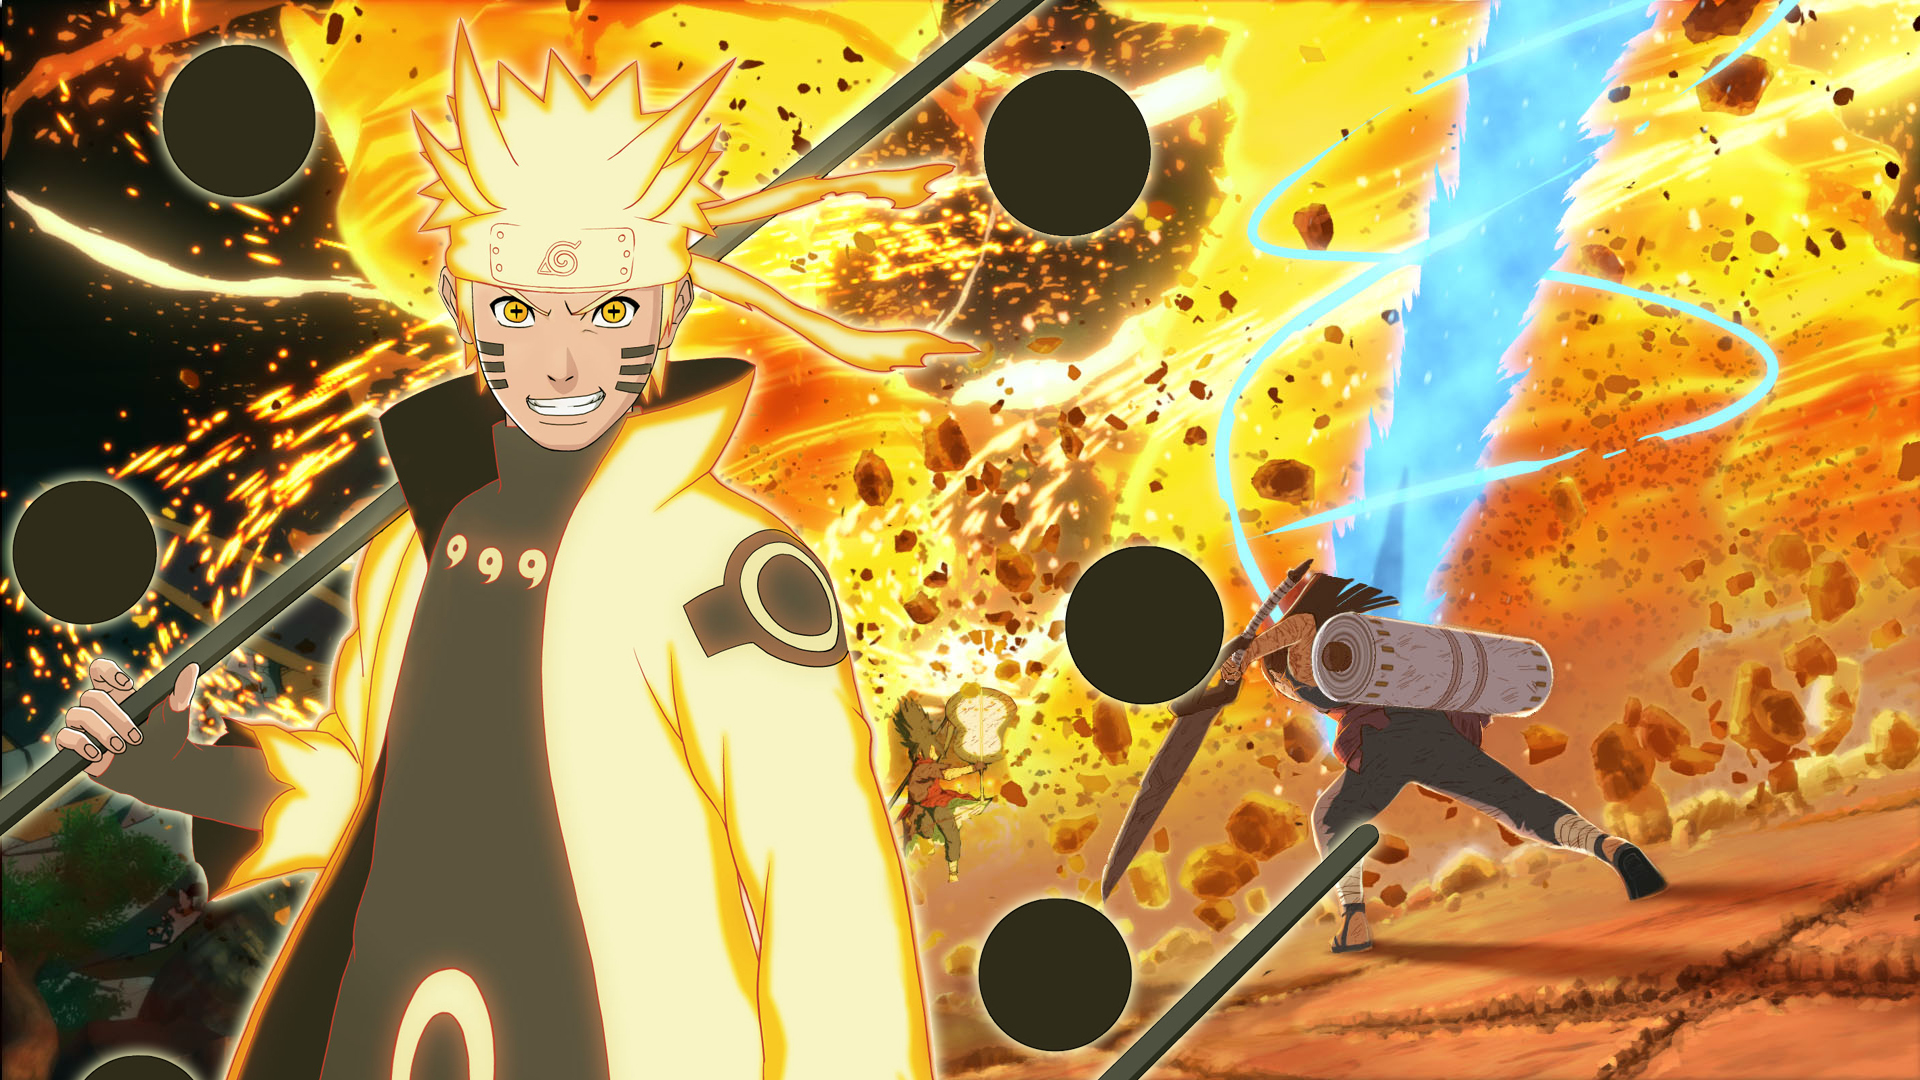 Best 47 Naruto Desktop Backgrounds on HipWallpaper